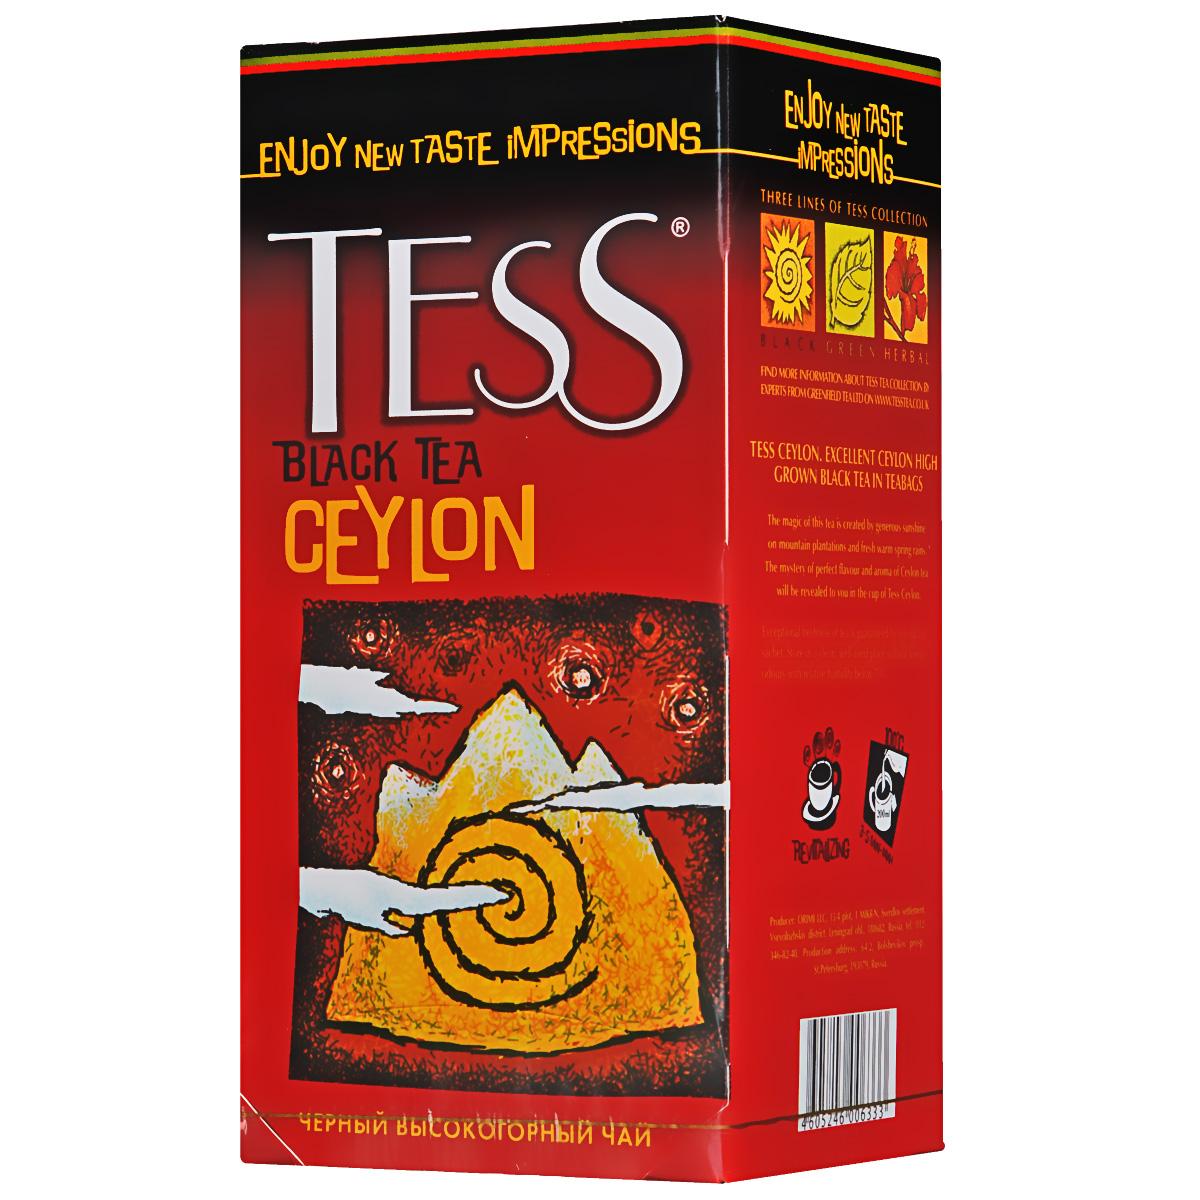 Tess Ceylon черный чай в пакетиках, 25 шт basilur assorted leaf of ceylon черный чай в пакетиках 20 шт